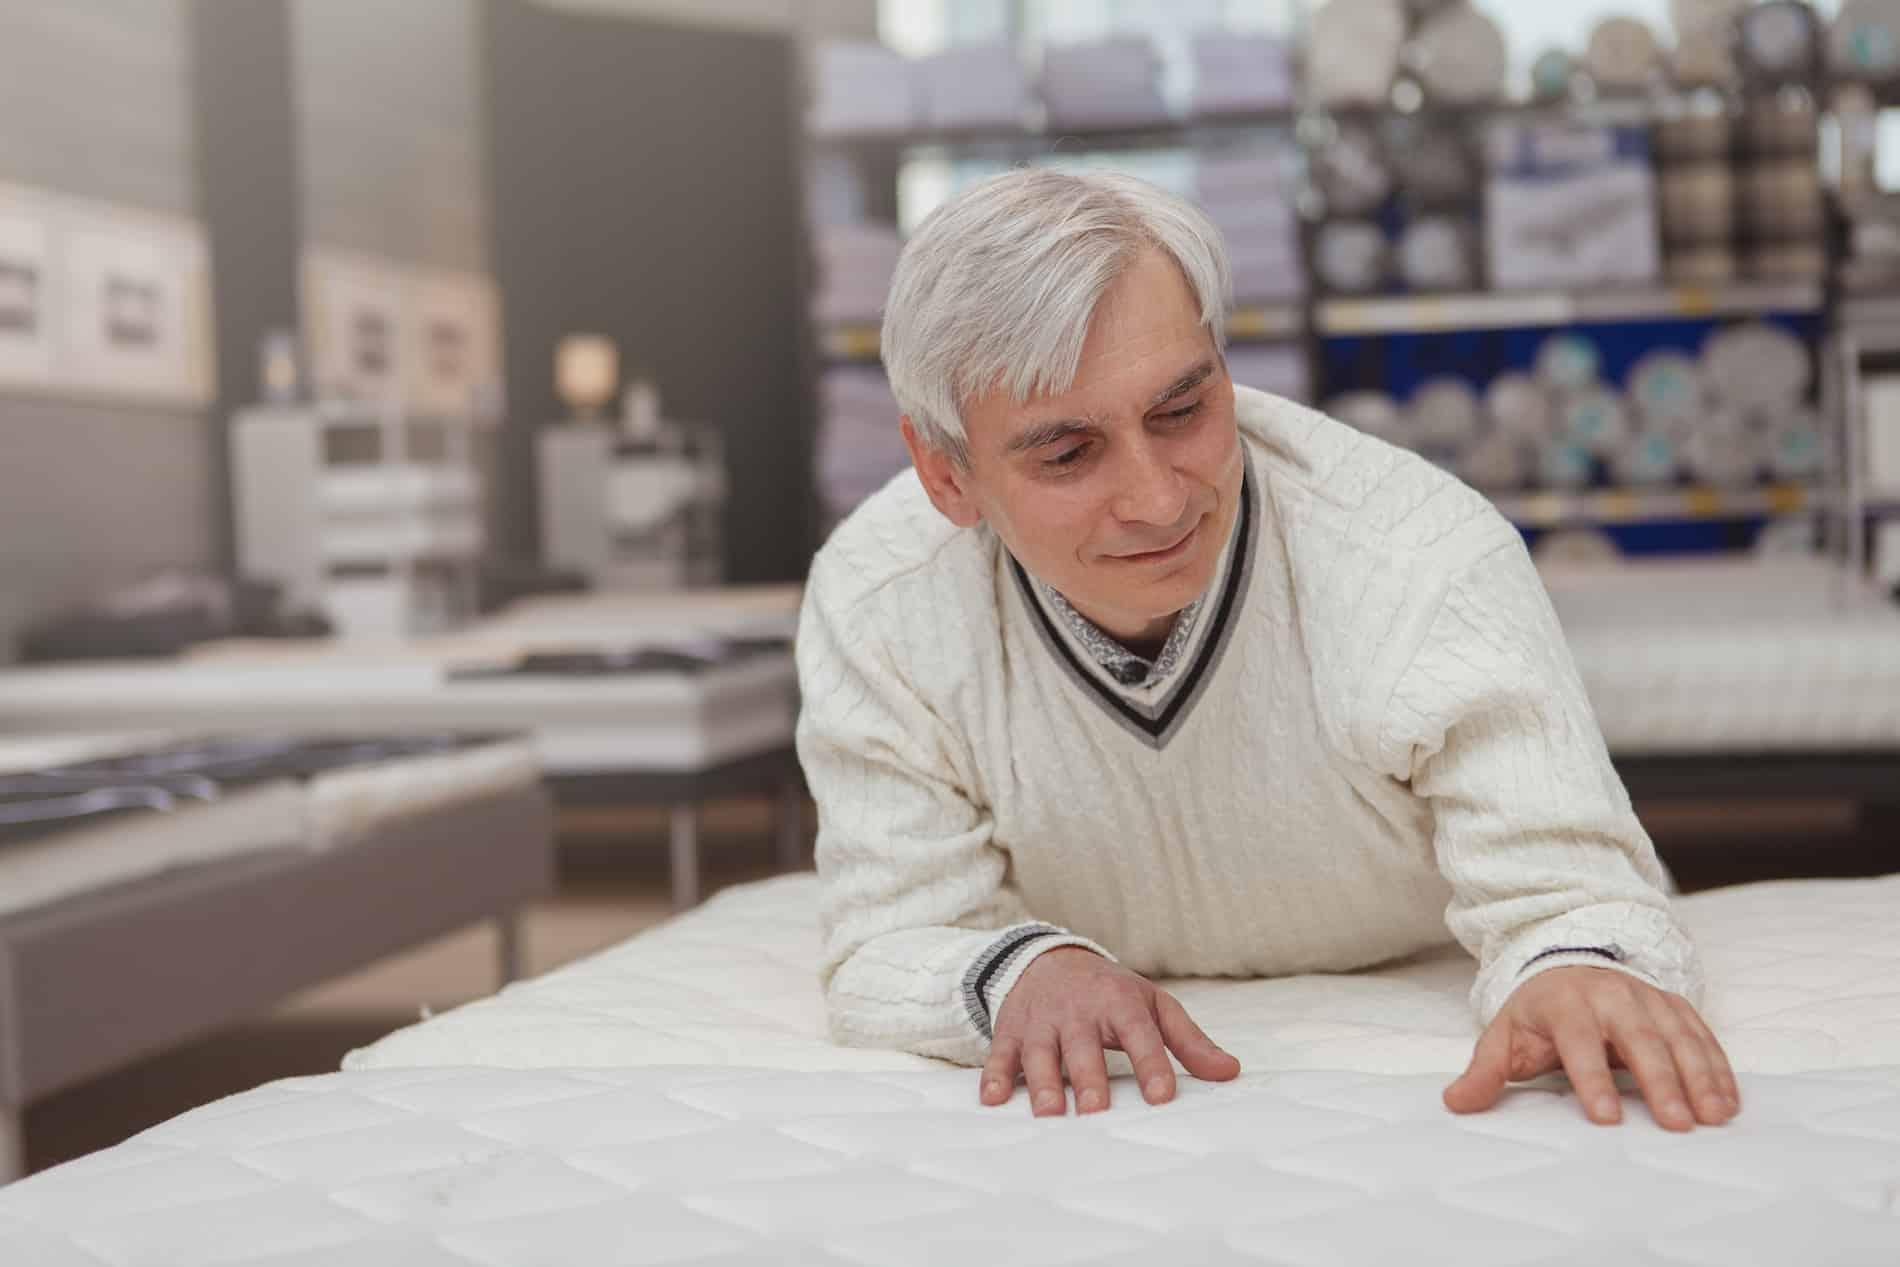 Senior man lying on orthopedic mattress at furniture store, copy space. Elderly male customer choosing new comfortable orthopedic bed at home goods store. Healthy sleep concept (Senior man lying on orthopedic mattress at furniture store, copy space. E